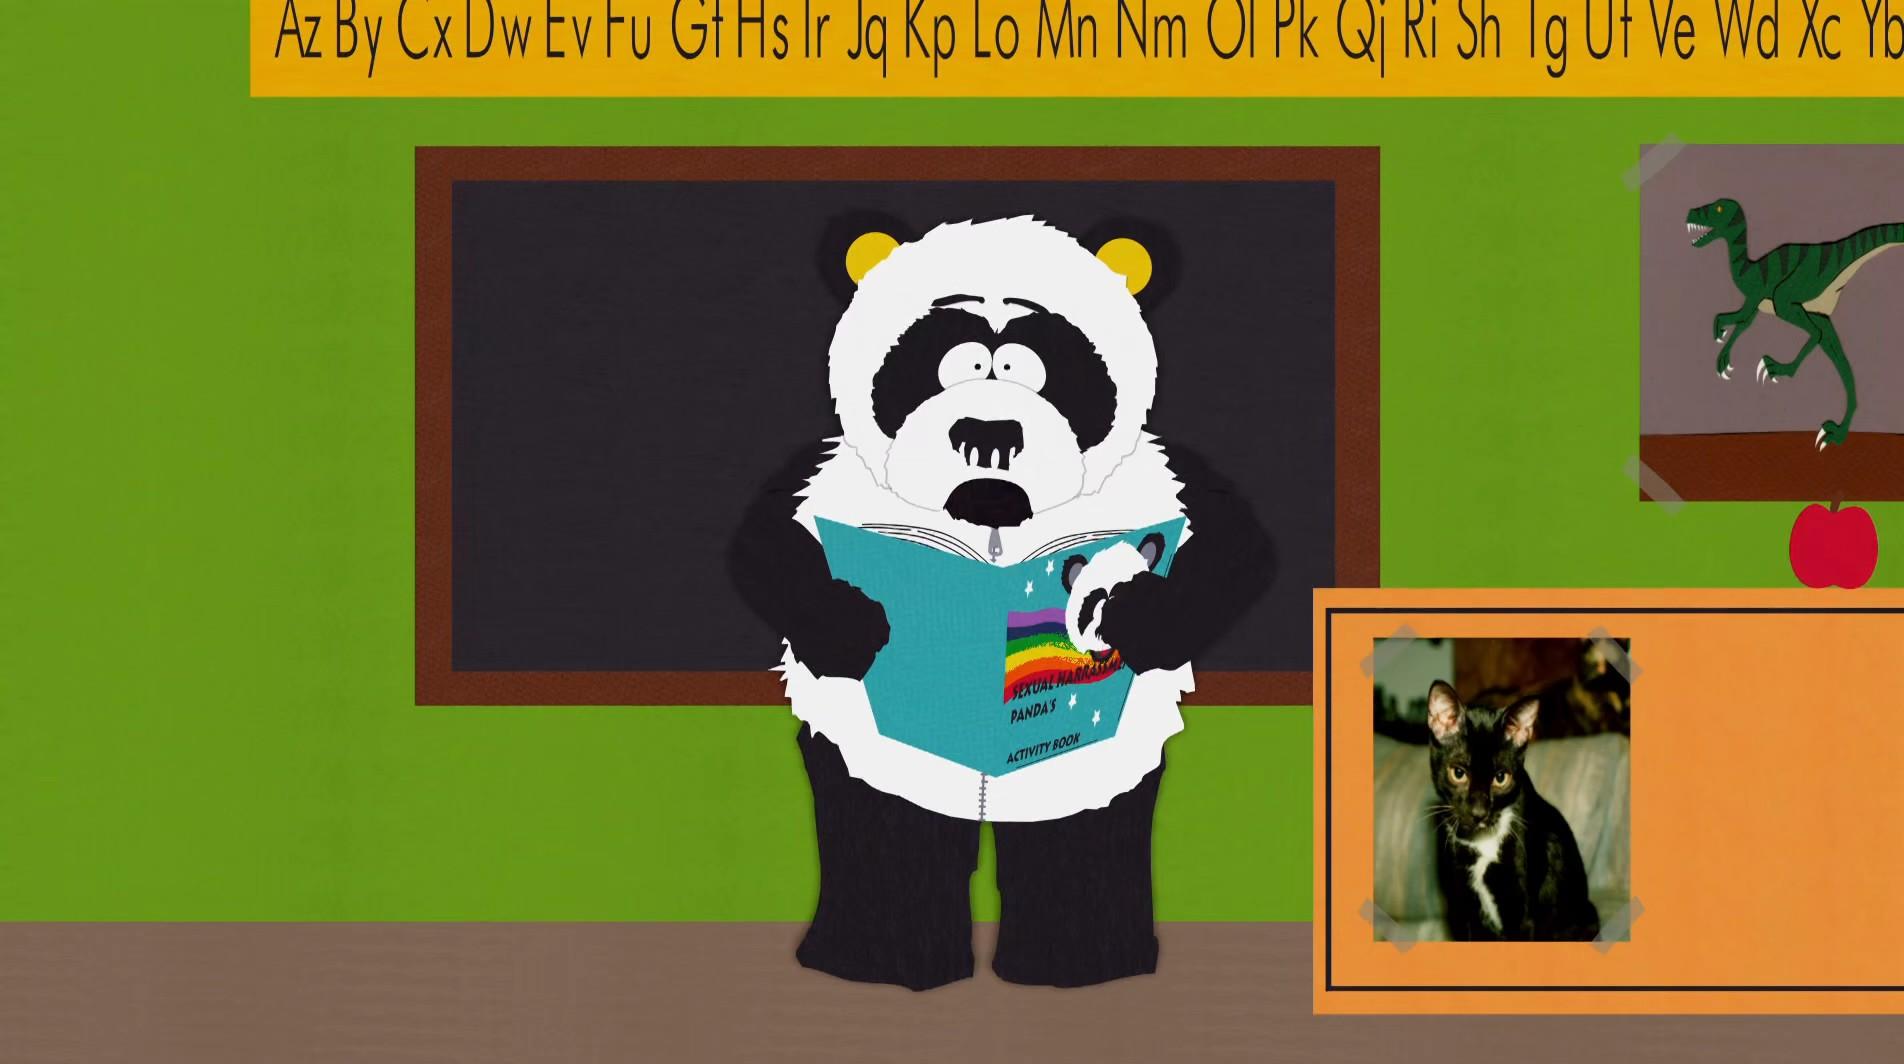 Han ji min and yoochun dating sim